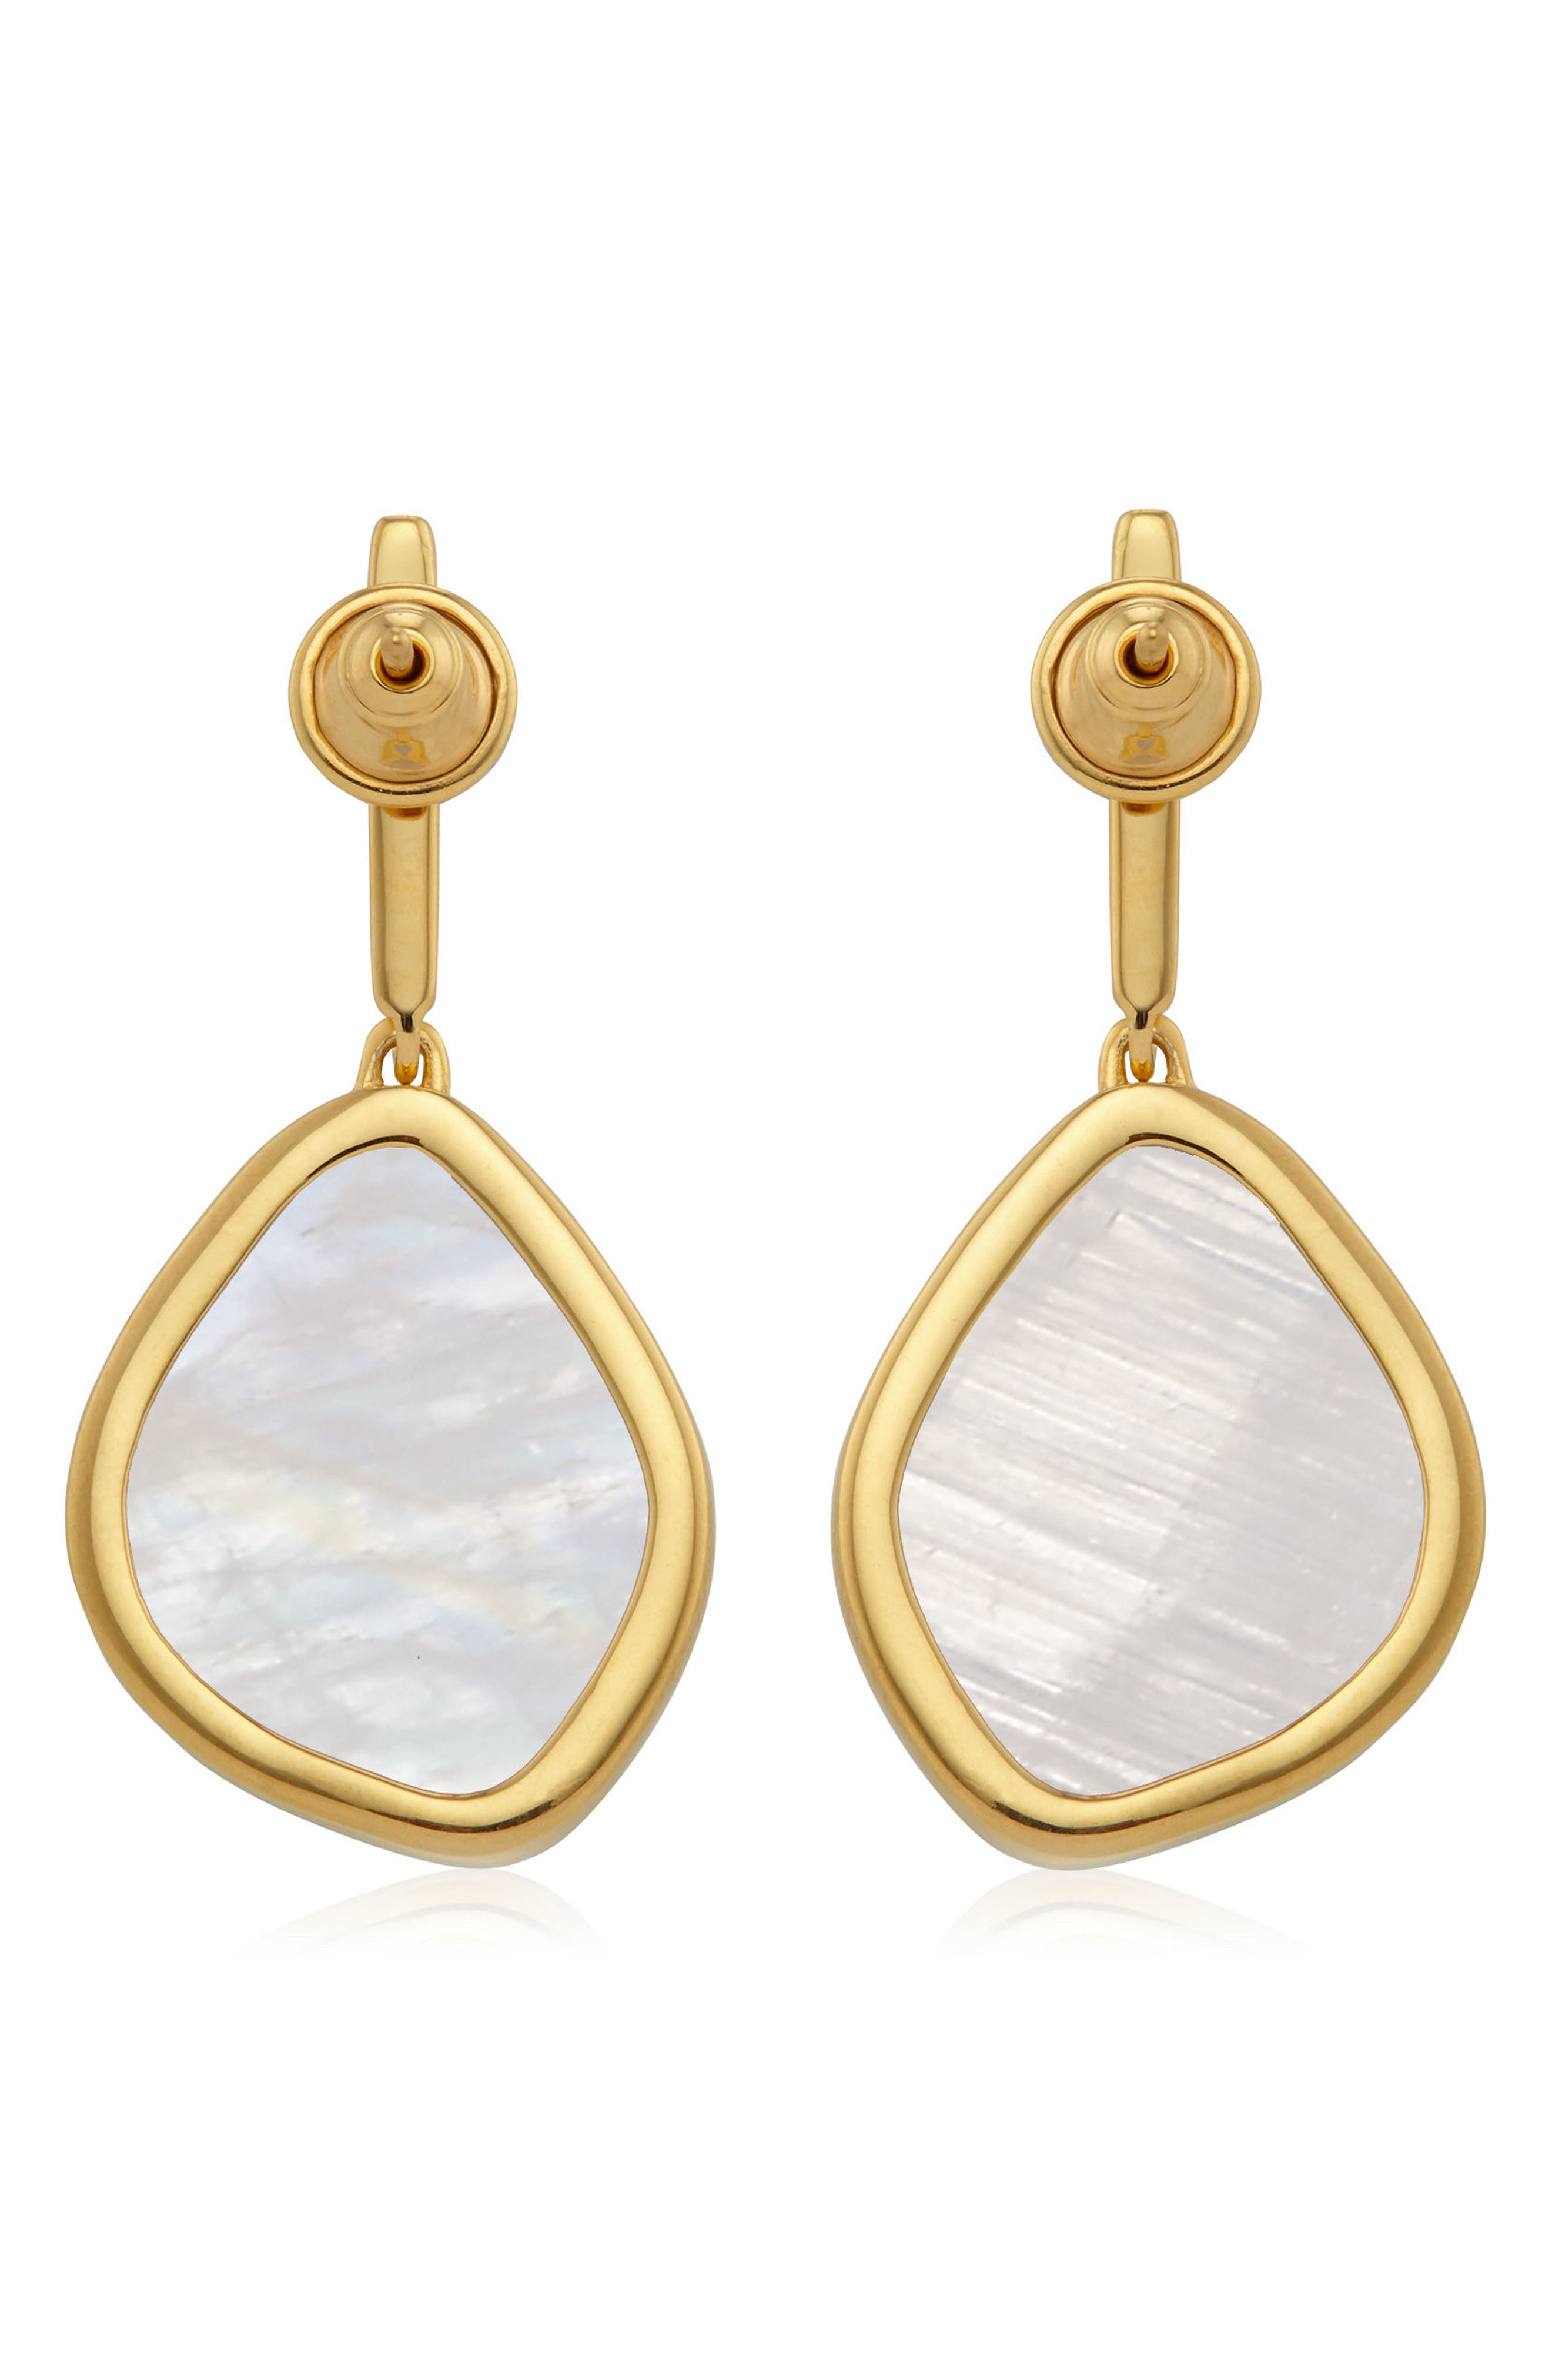 Siren Nugget Semiprecious Stone Drop Earrings,                             Alternate thumbnail 2, color,                             Yellow Gold/ Moonstone